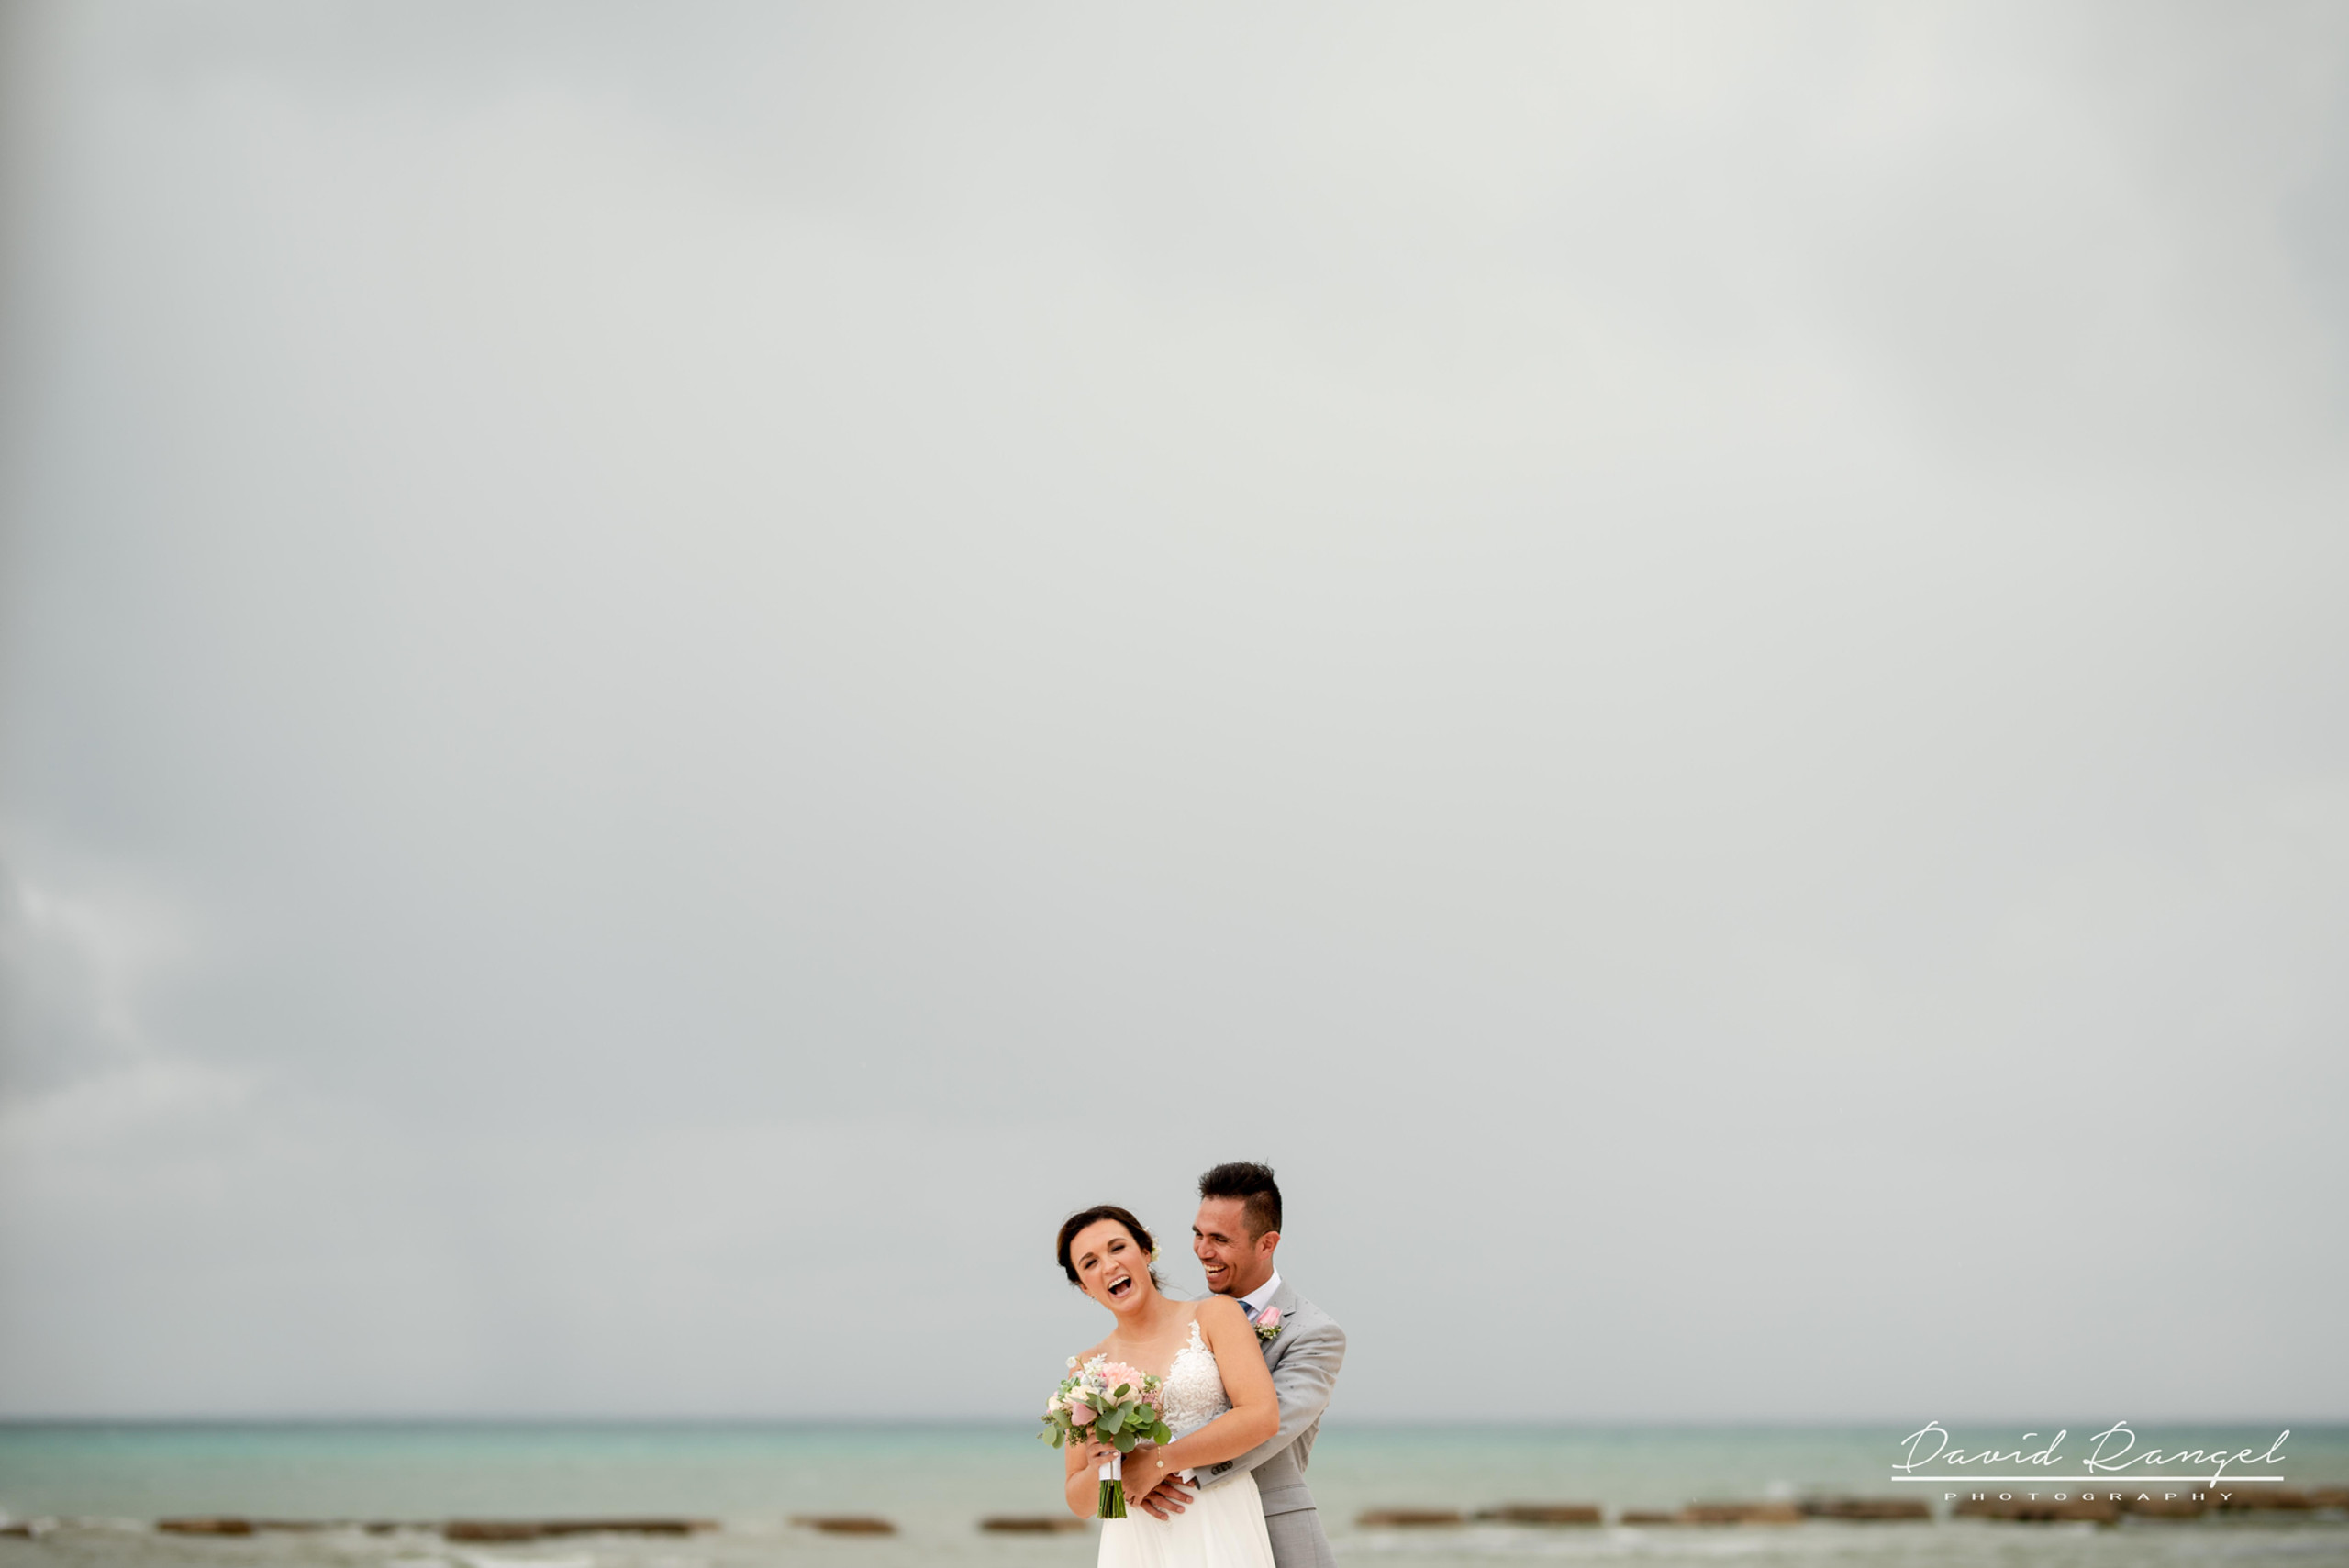 Beach+photo+session+couple+love+hugh+kiss+bride+groom